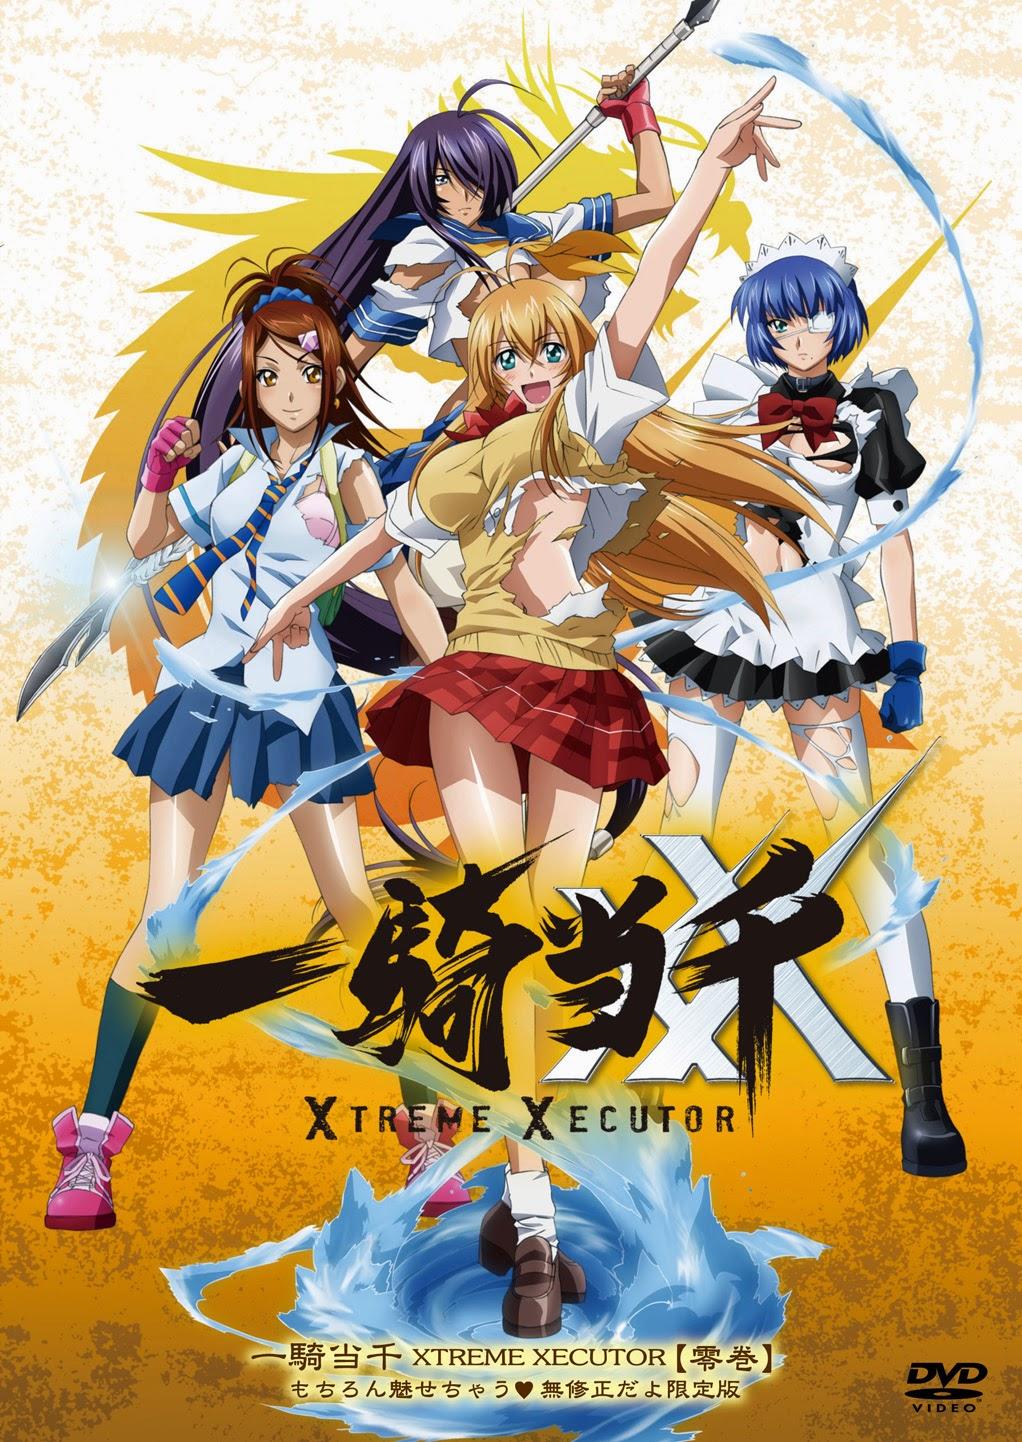 File:Ikkitousen Xtreme Xecutor dvd cover.jpg